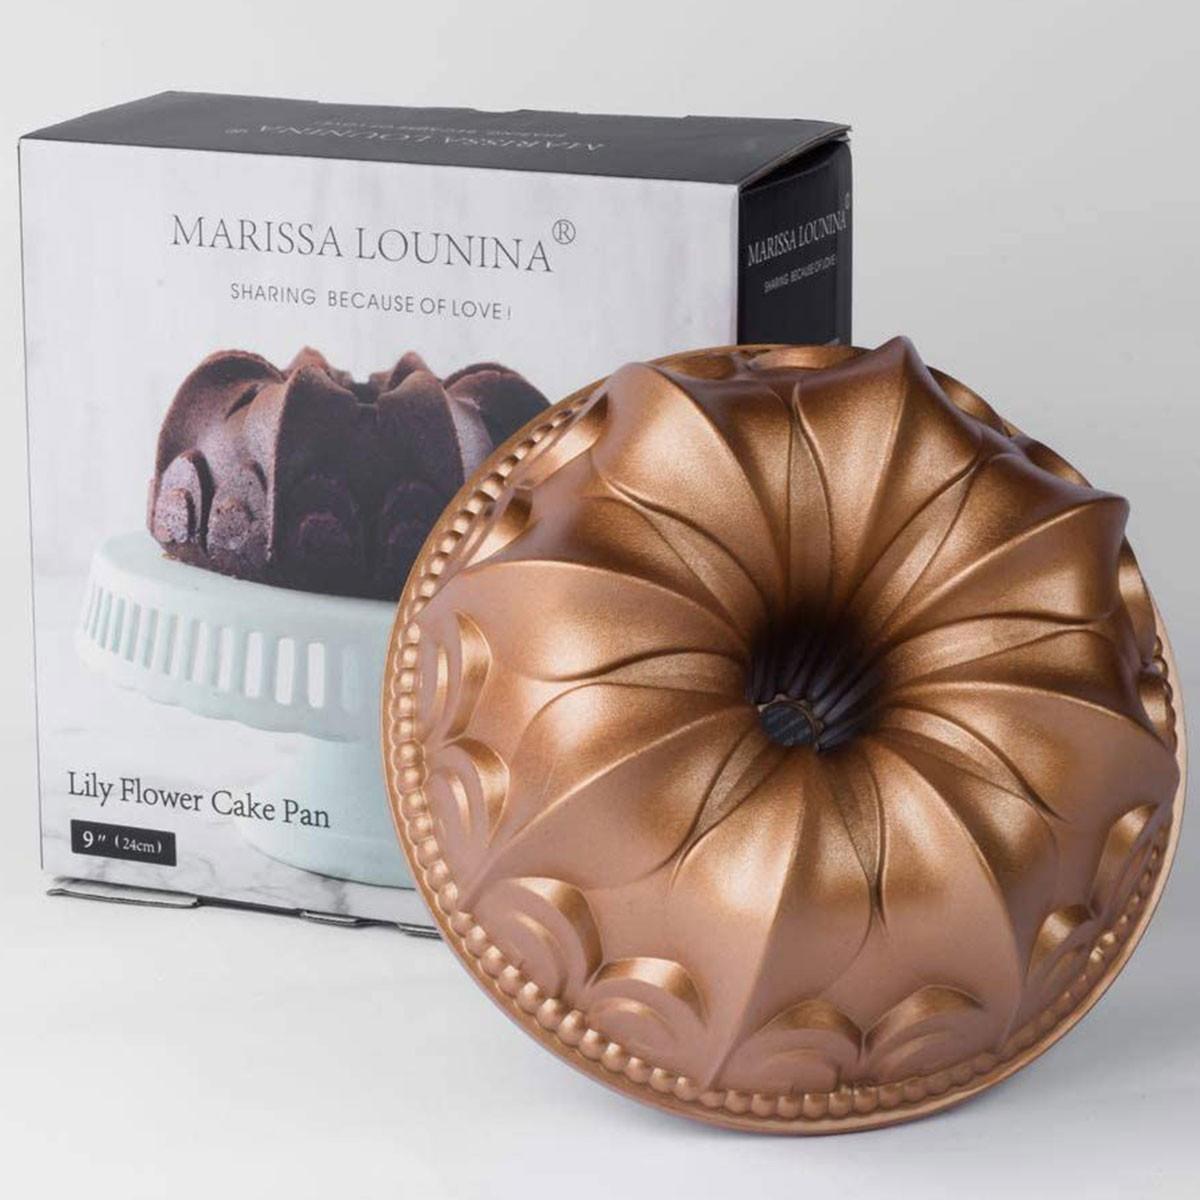 Forma Marissa Lounina Lily Flower Cake Pan